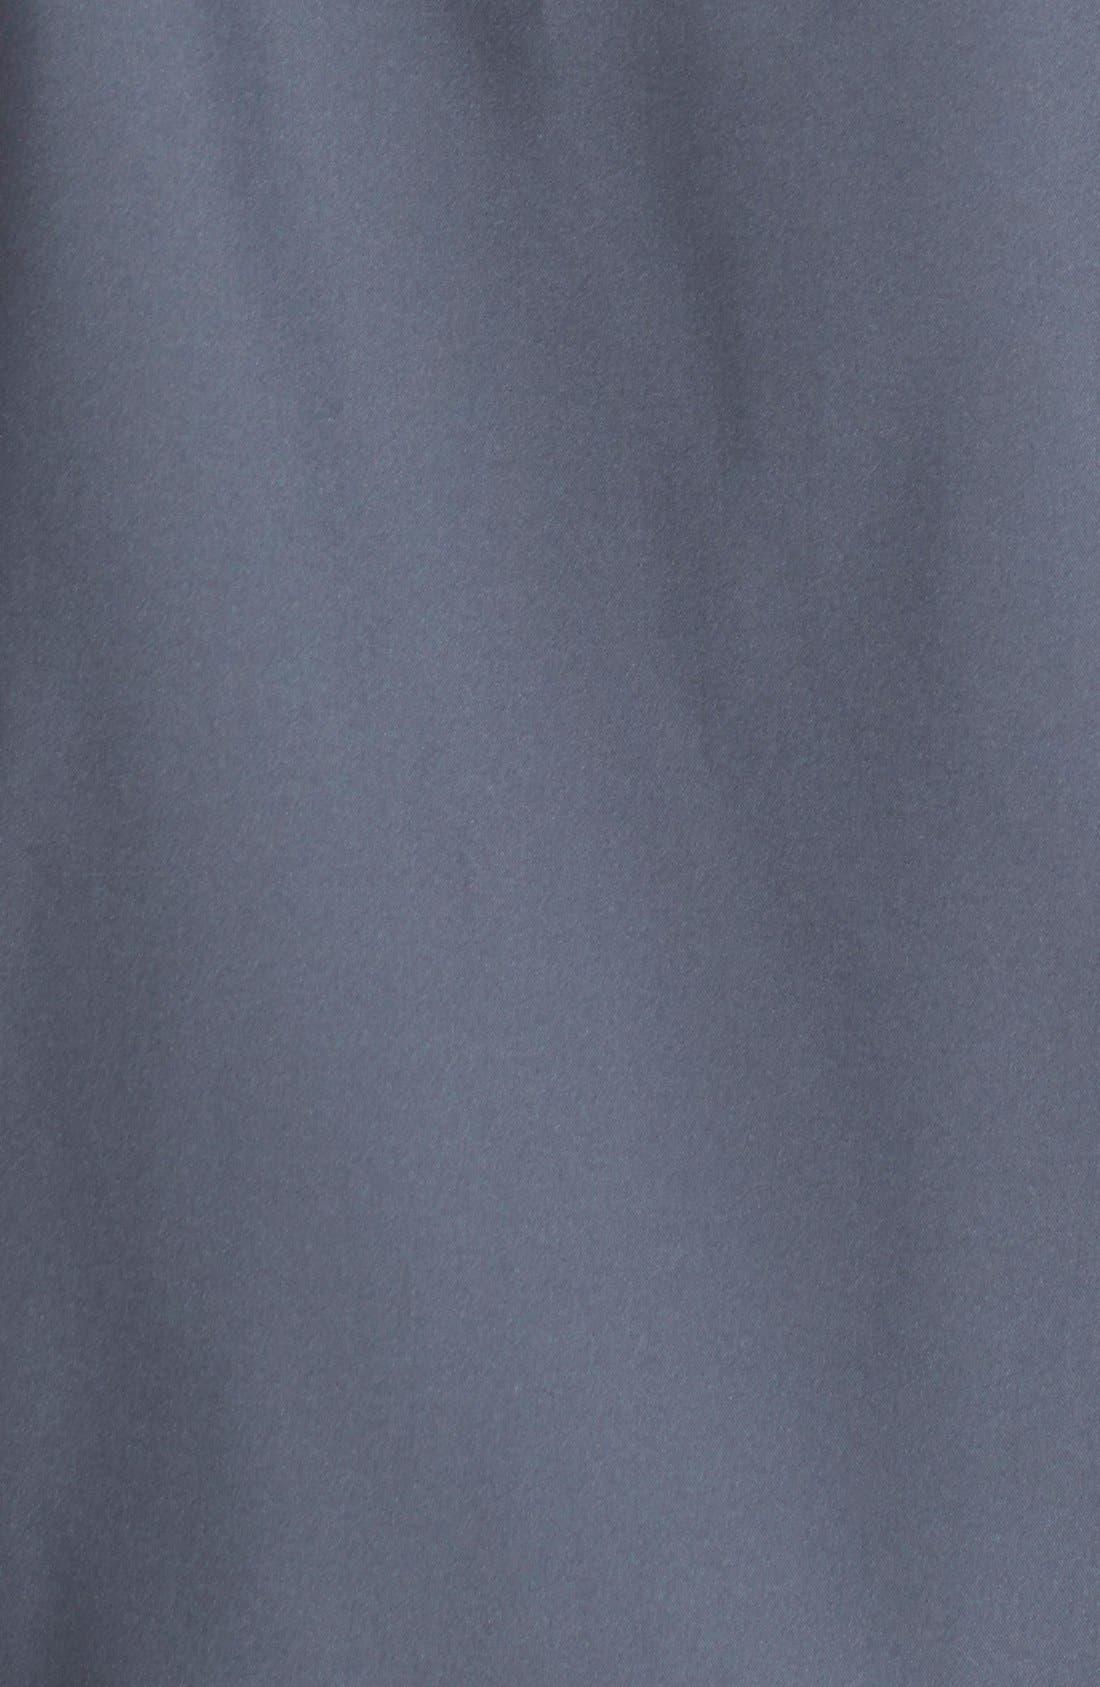 Alternate Image 3  - Cutter & Buck Beacon WeatherTec Wind & Water Resistant Jacket